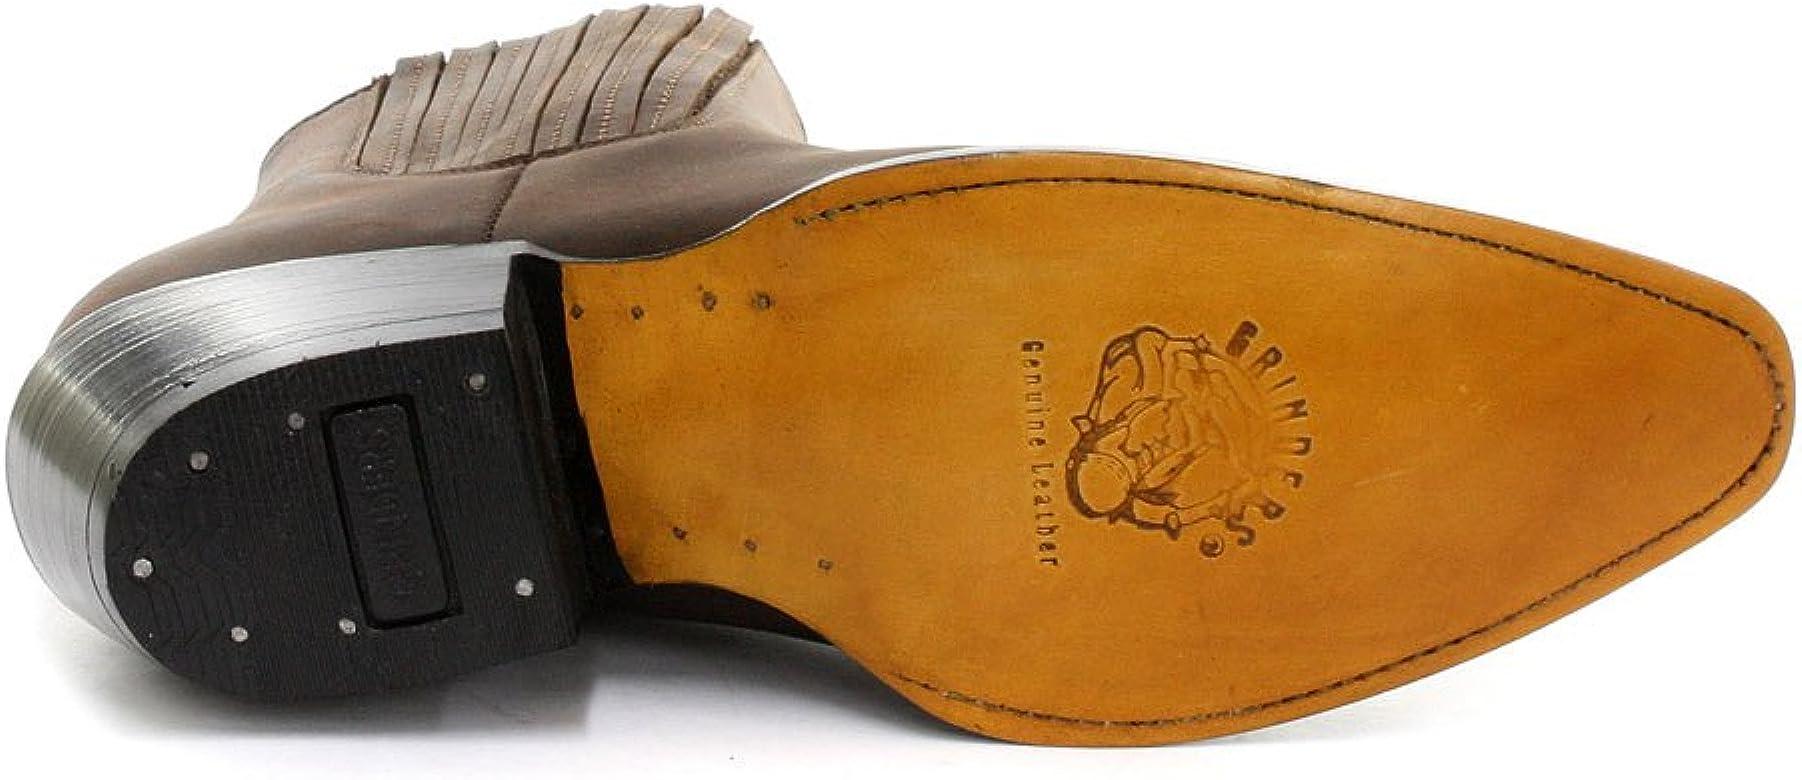 Men/'s GRINDERS MAVERICK Black Cowboy Western Slip-On Leather Ankle Boots Shoes